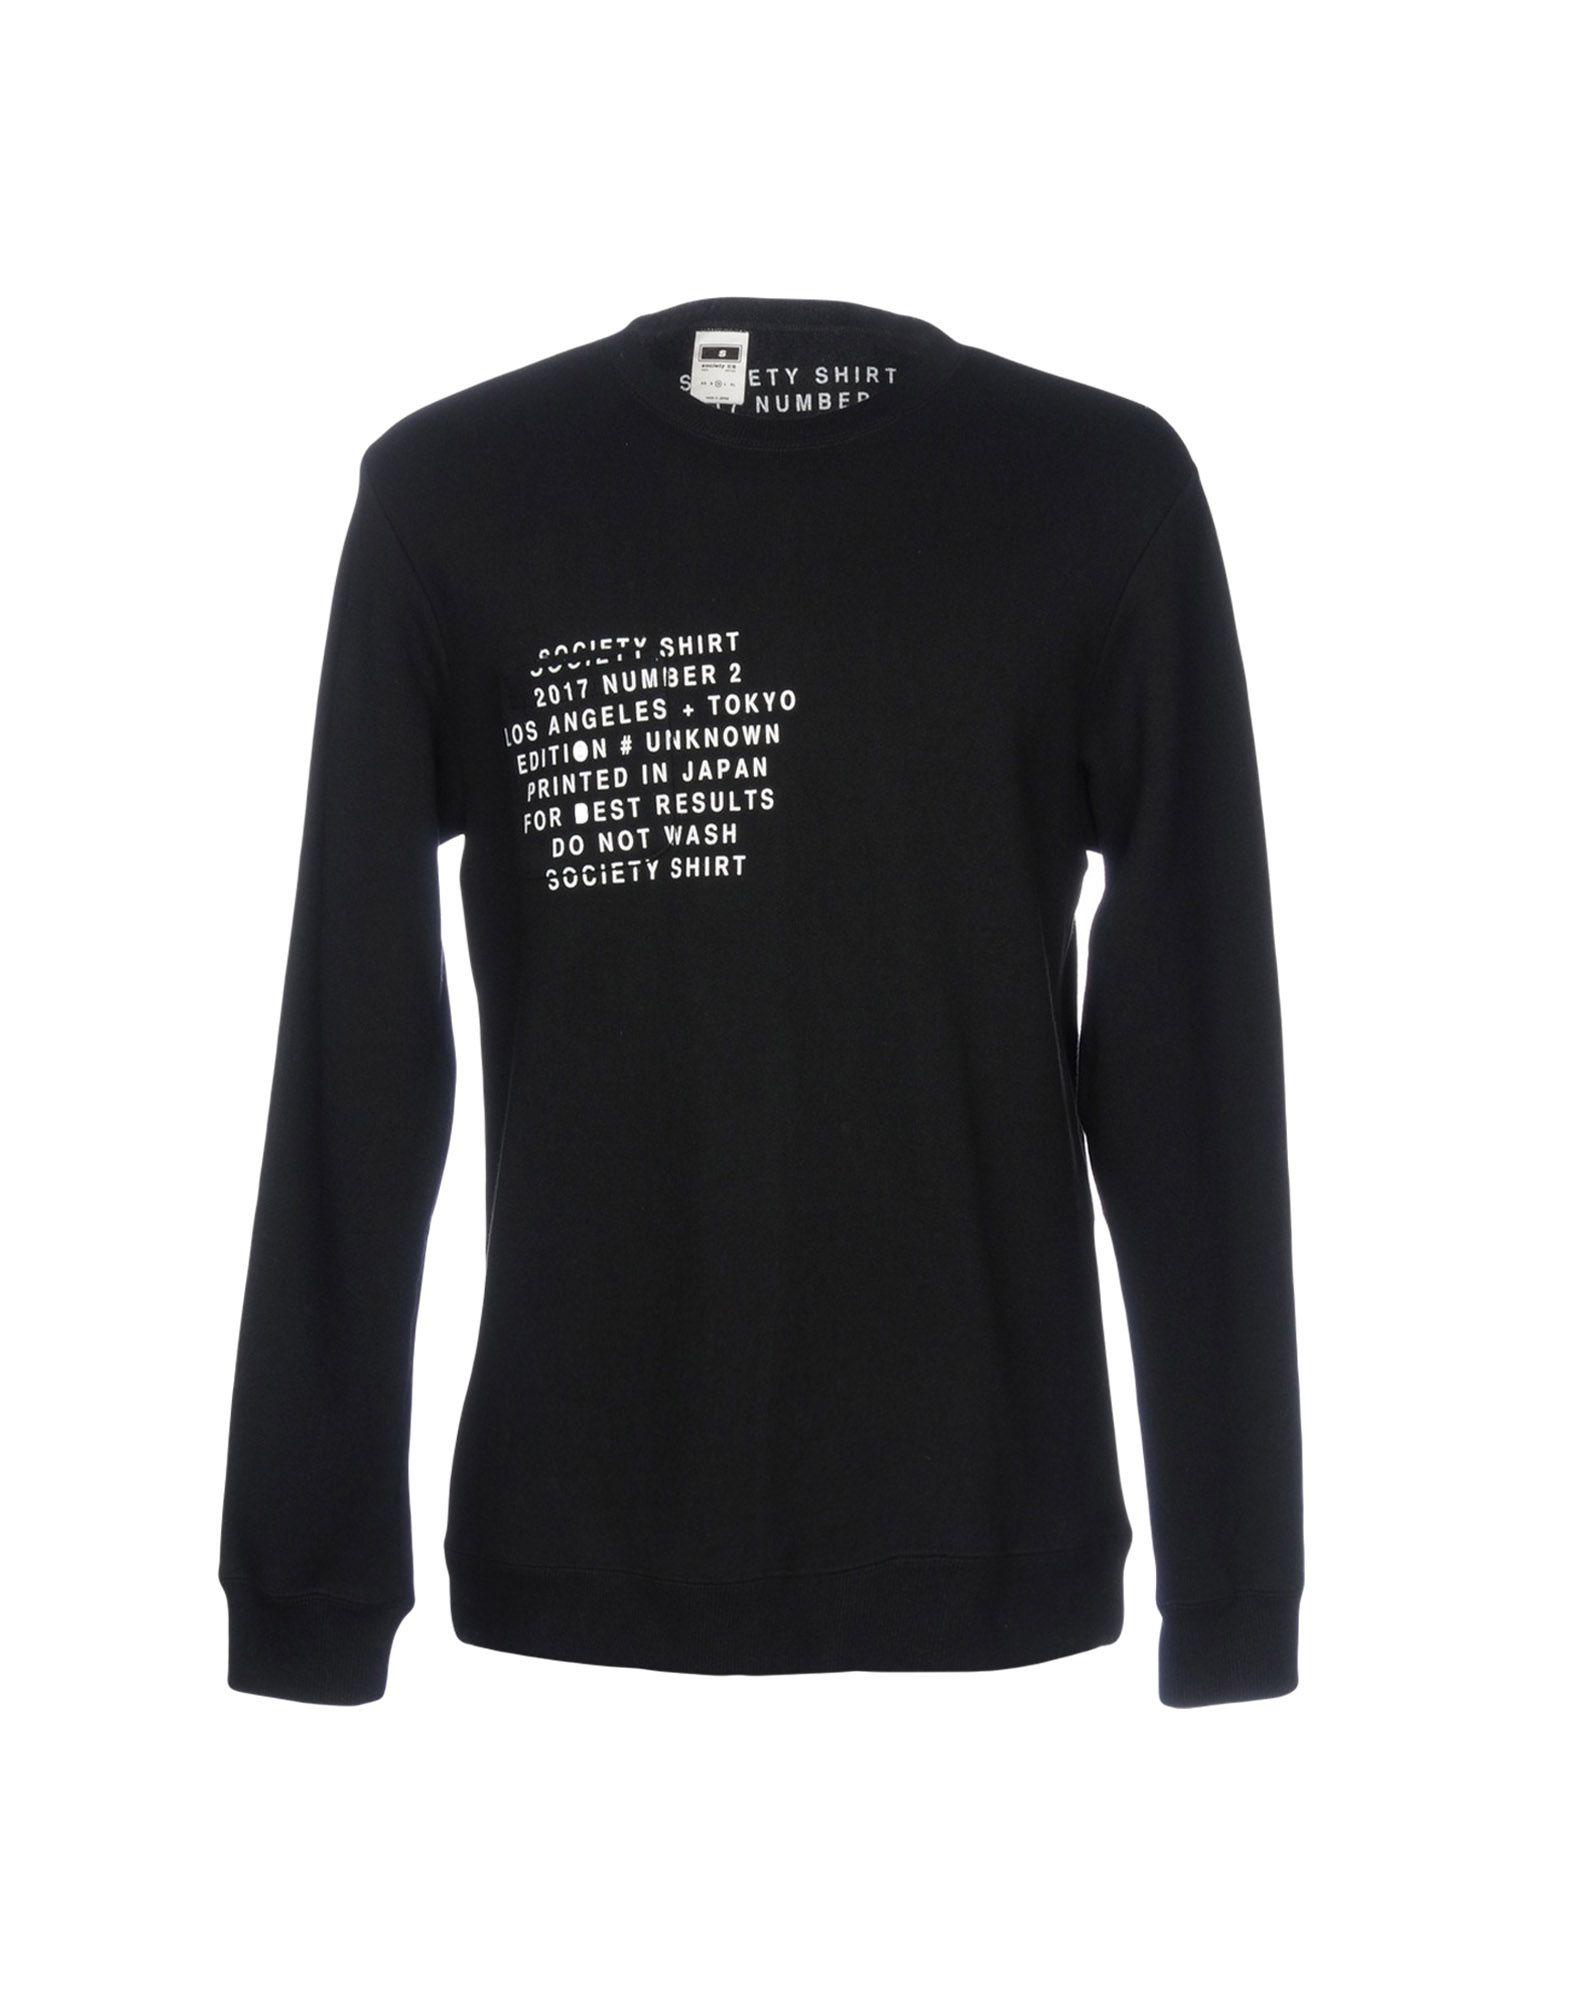 SOCIETY Sweatshirt in Black